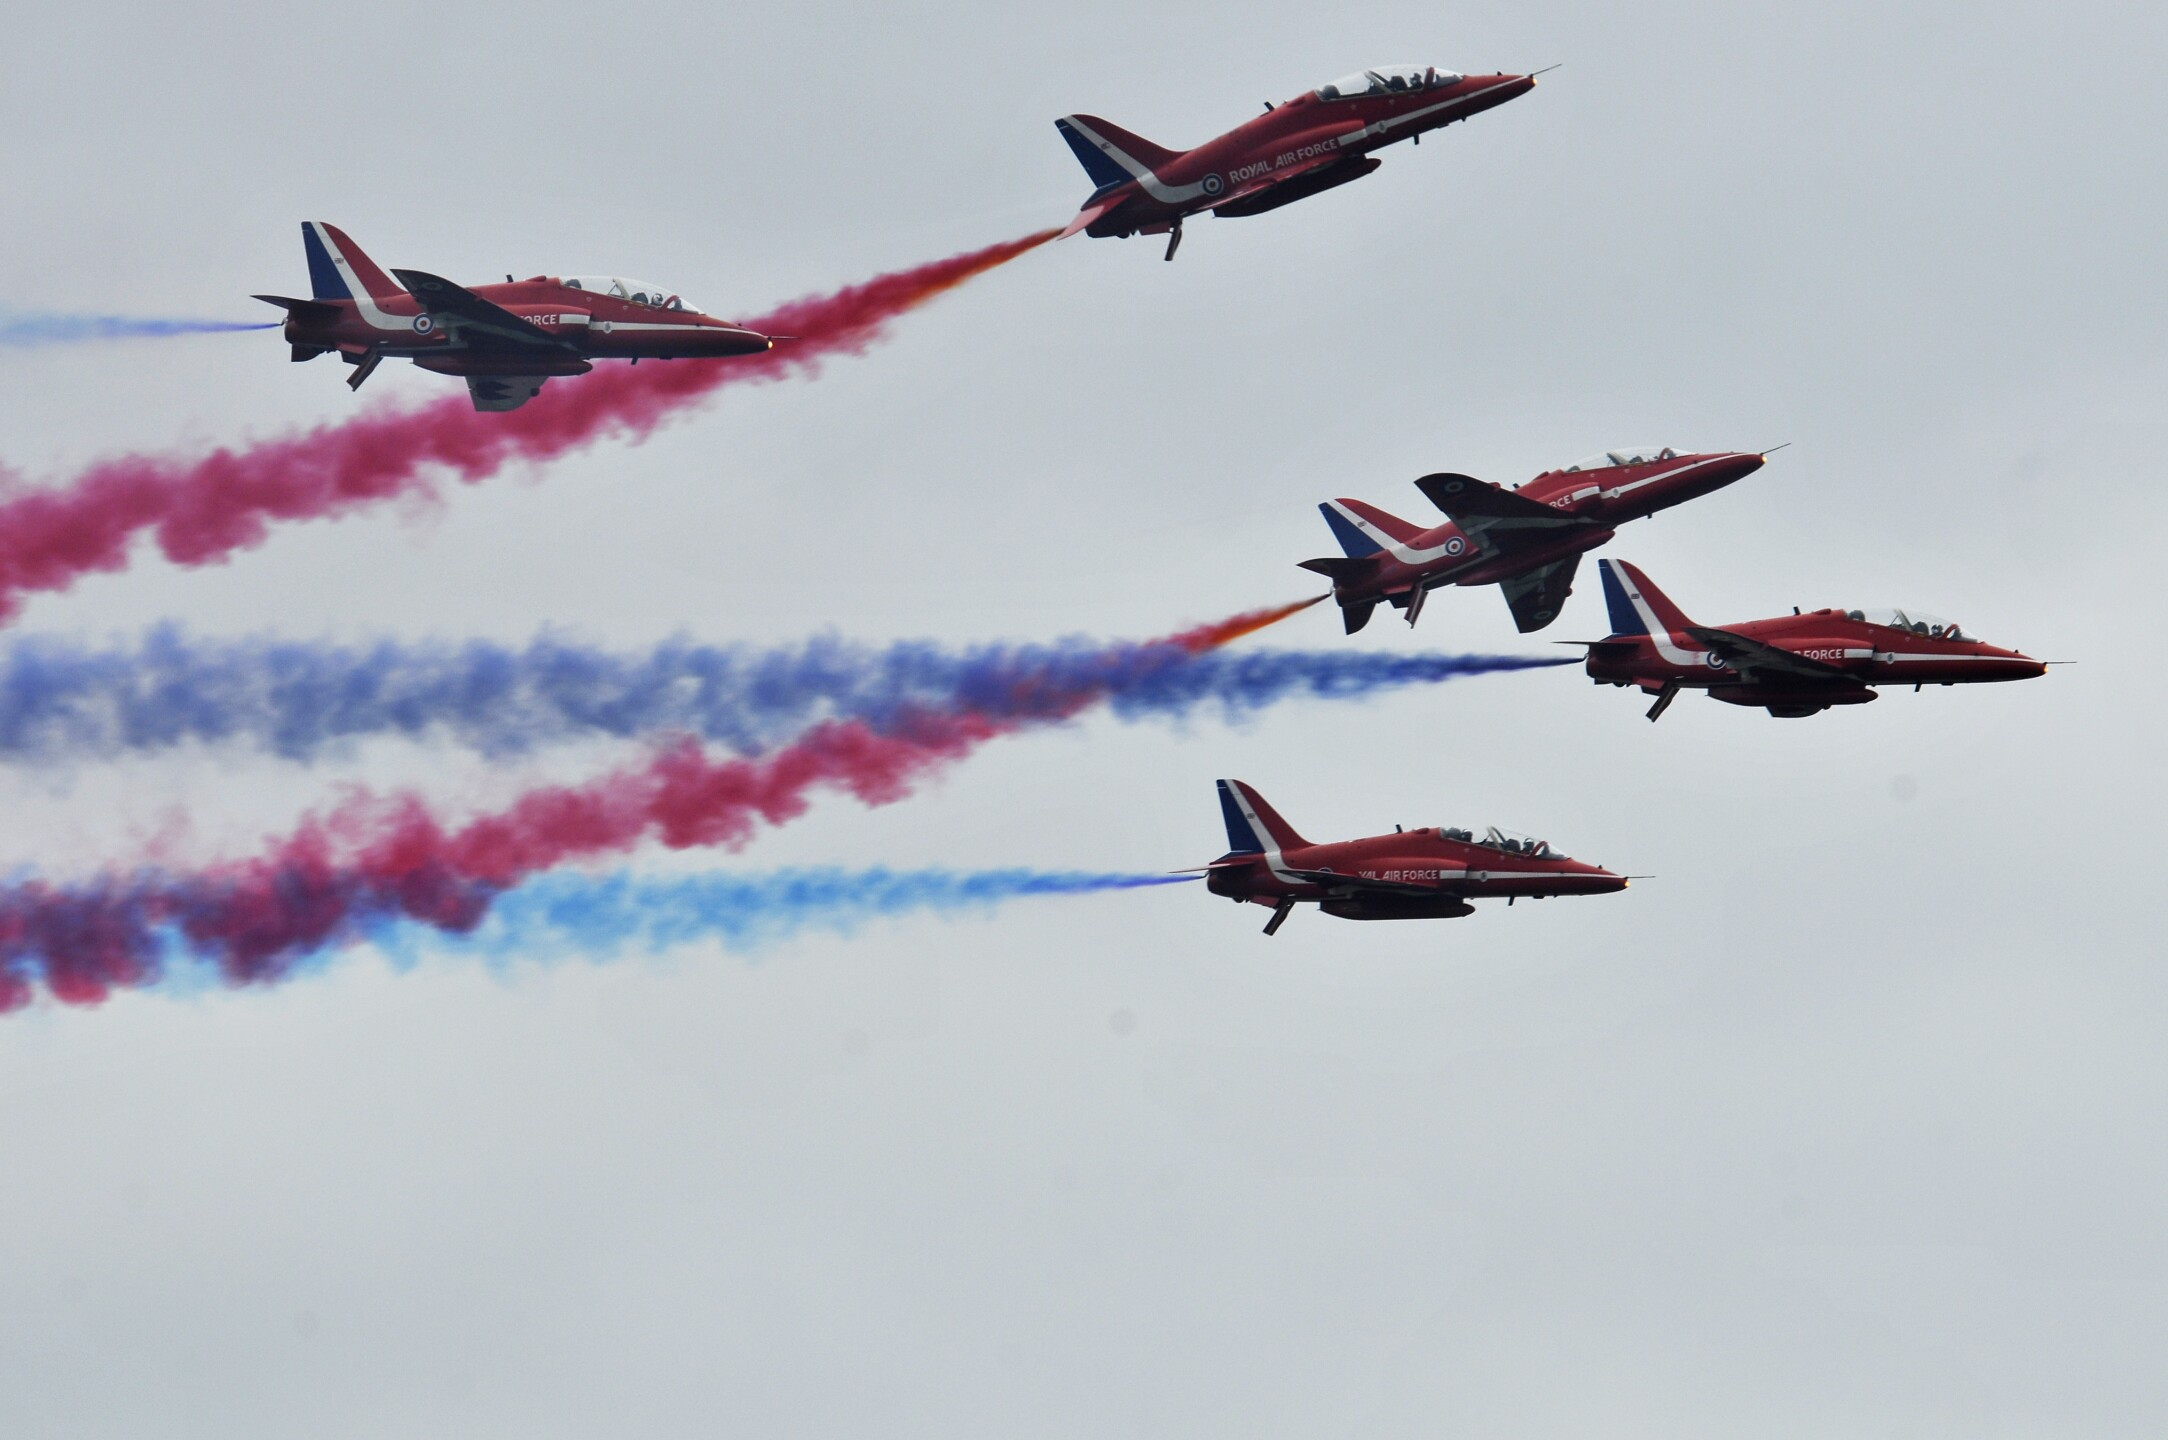 Farnborough 2012/14 July